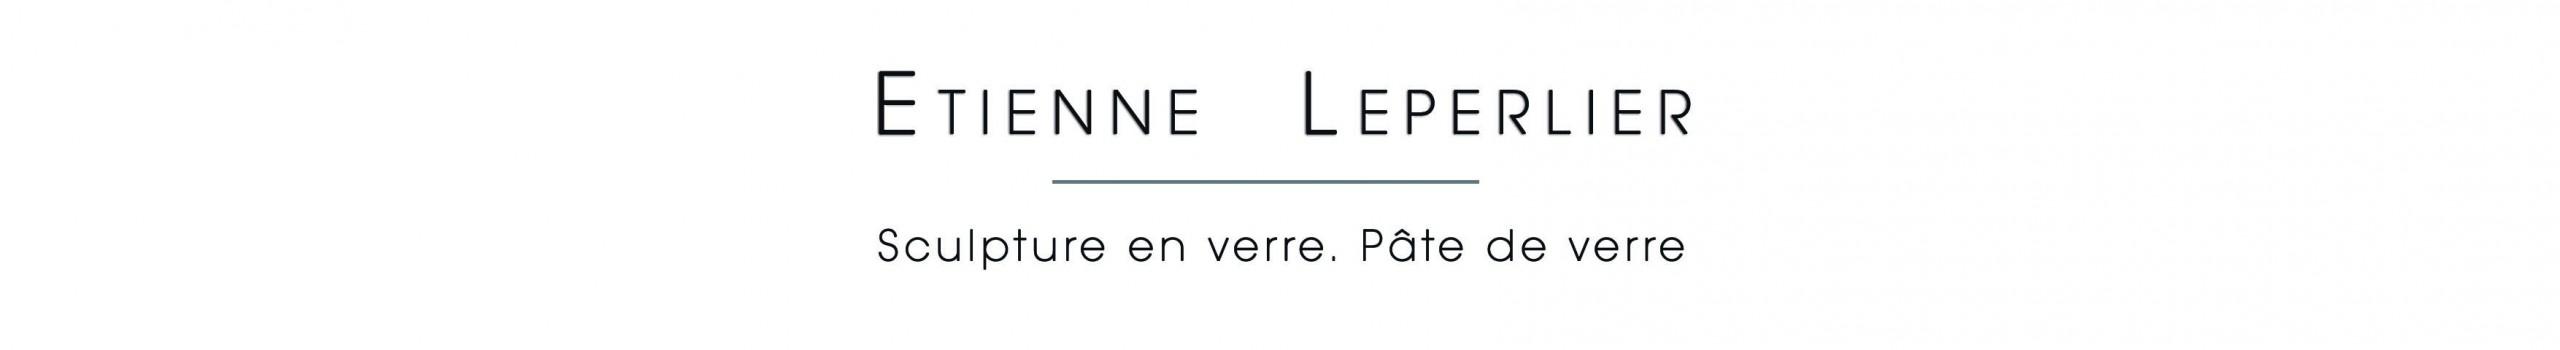 Etienne Leperlier